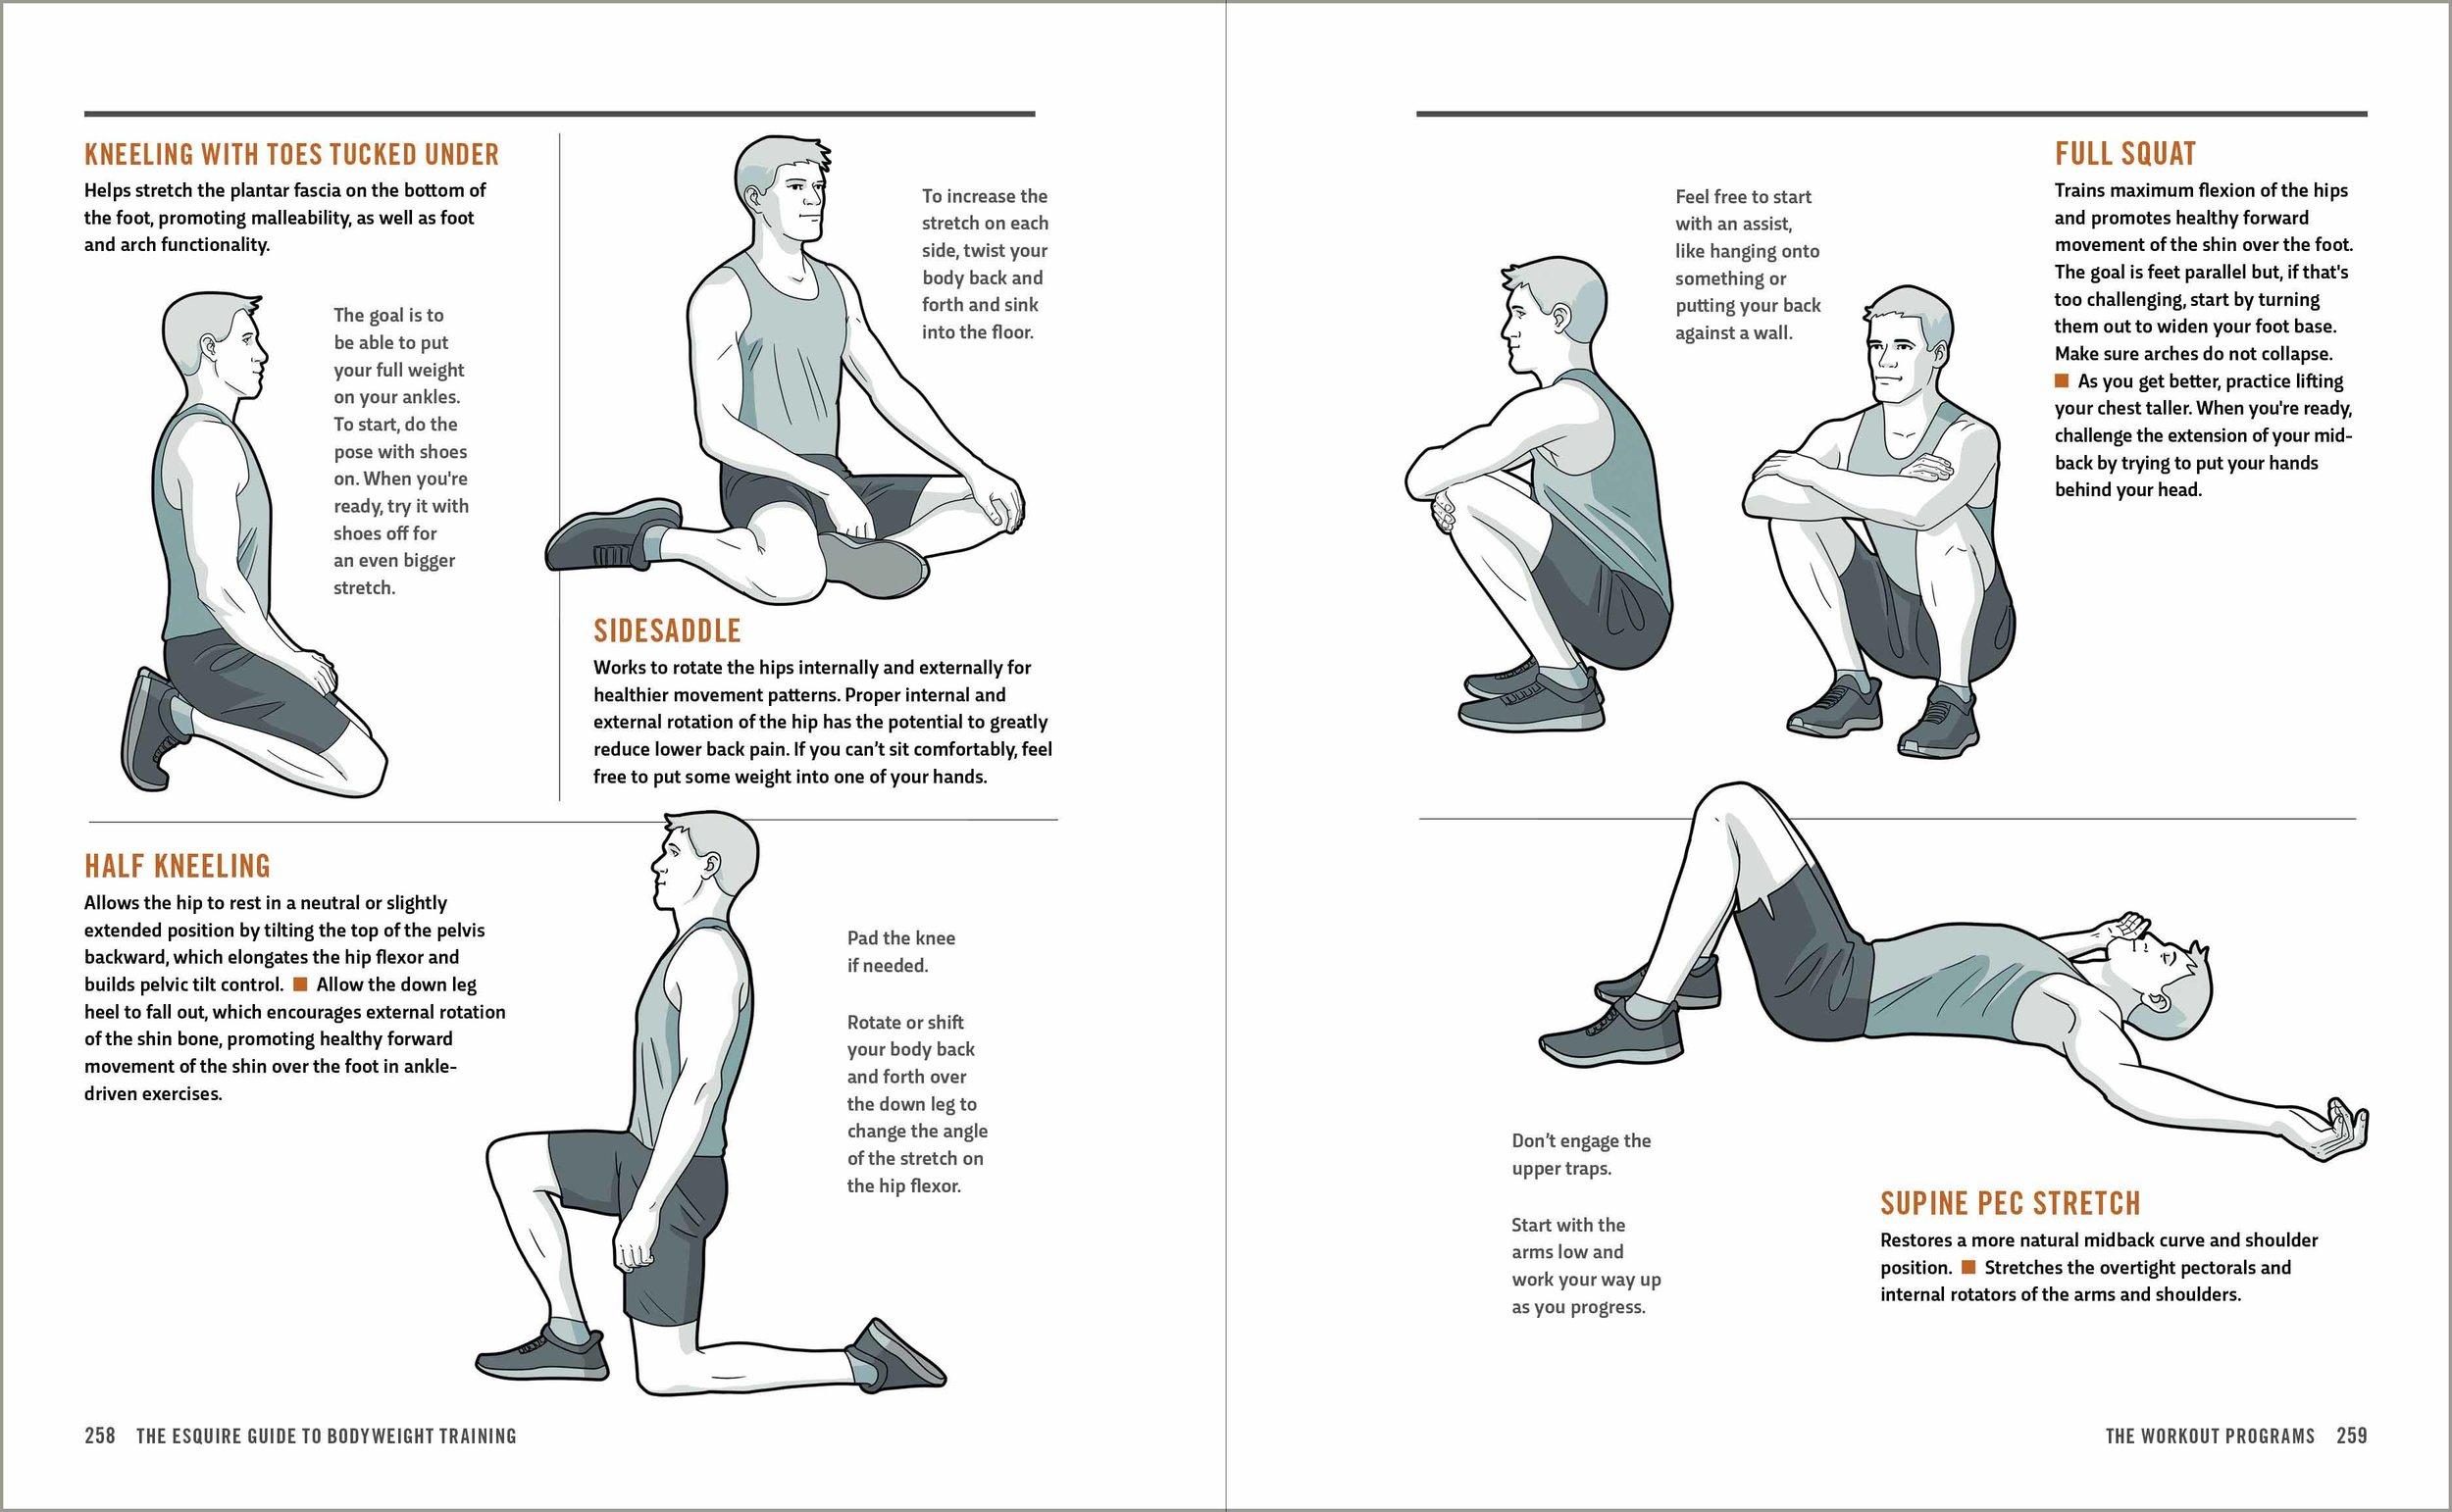 esquire-bodyweight-training-12.jpg